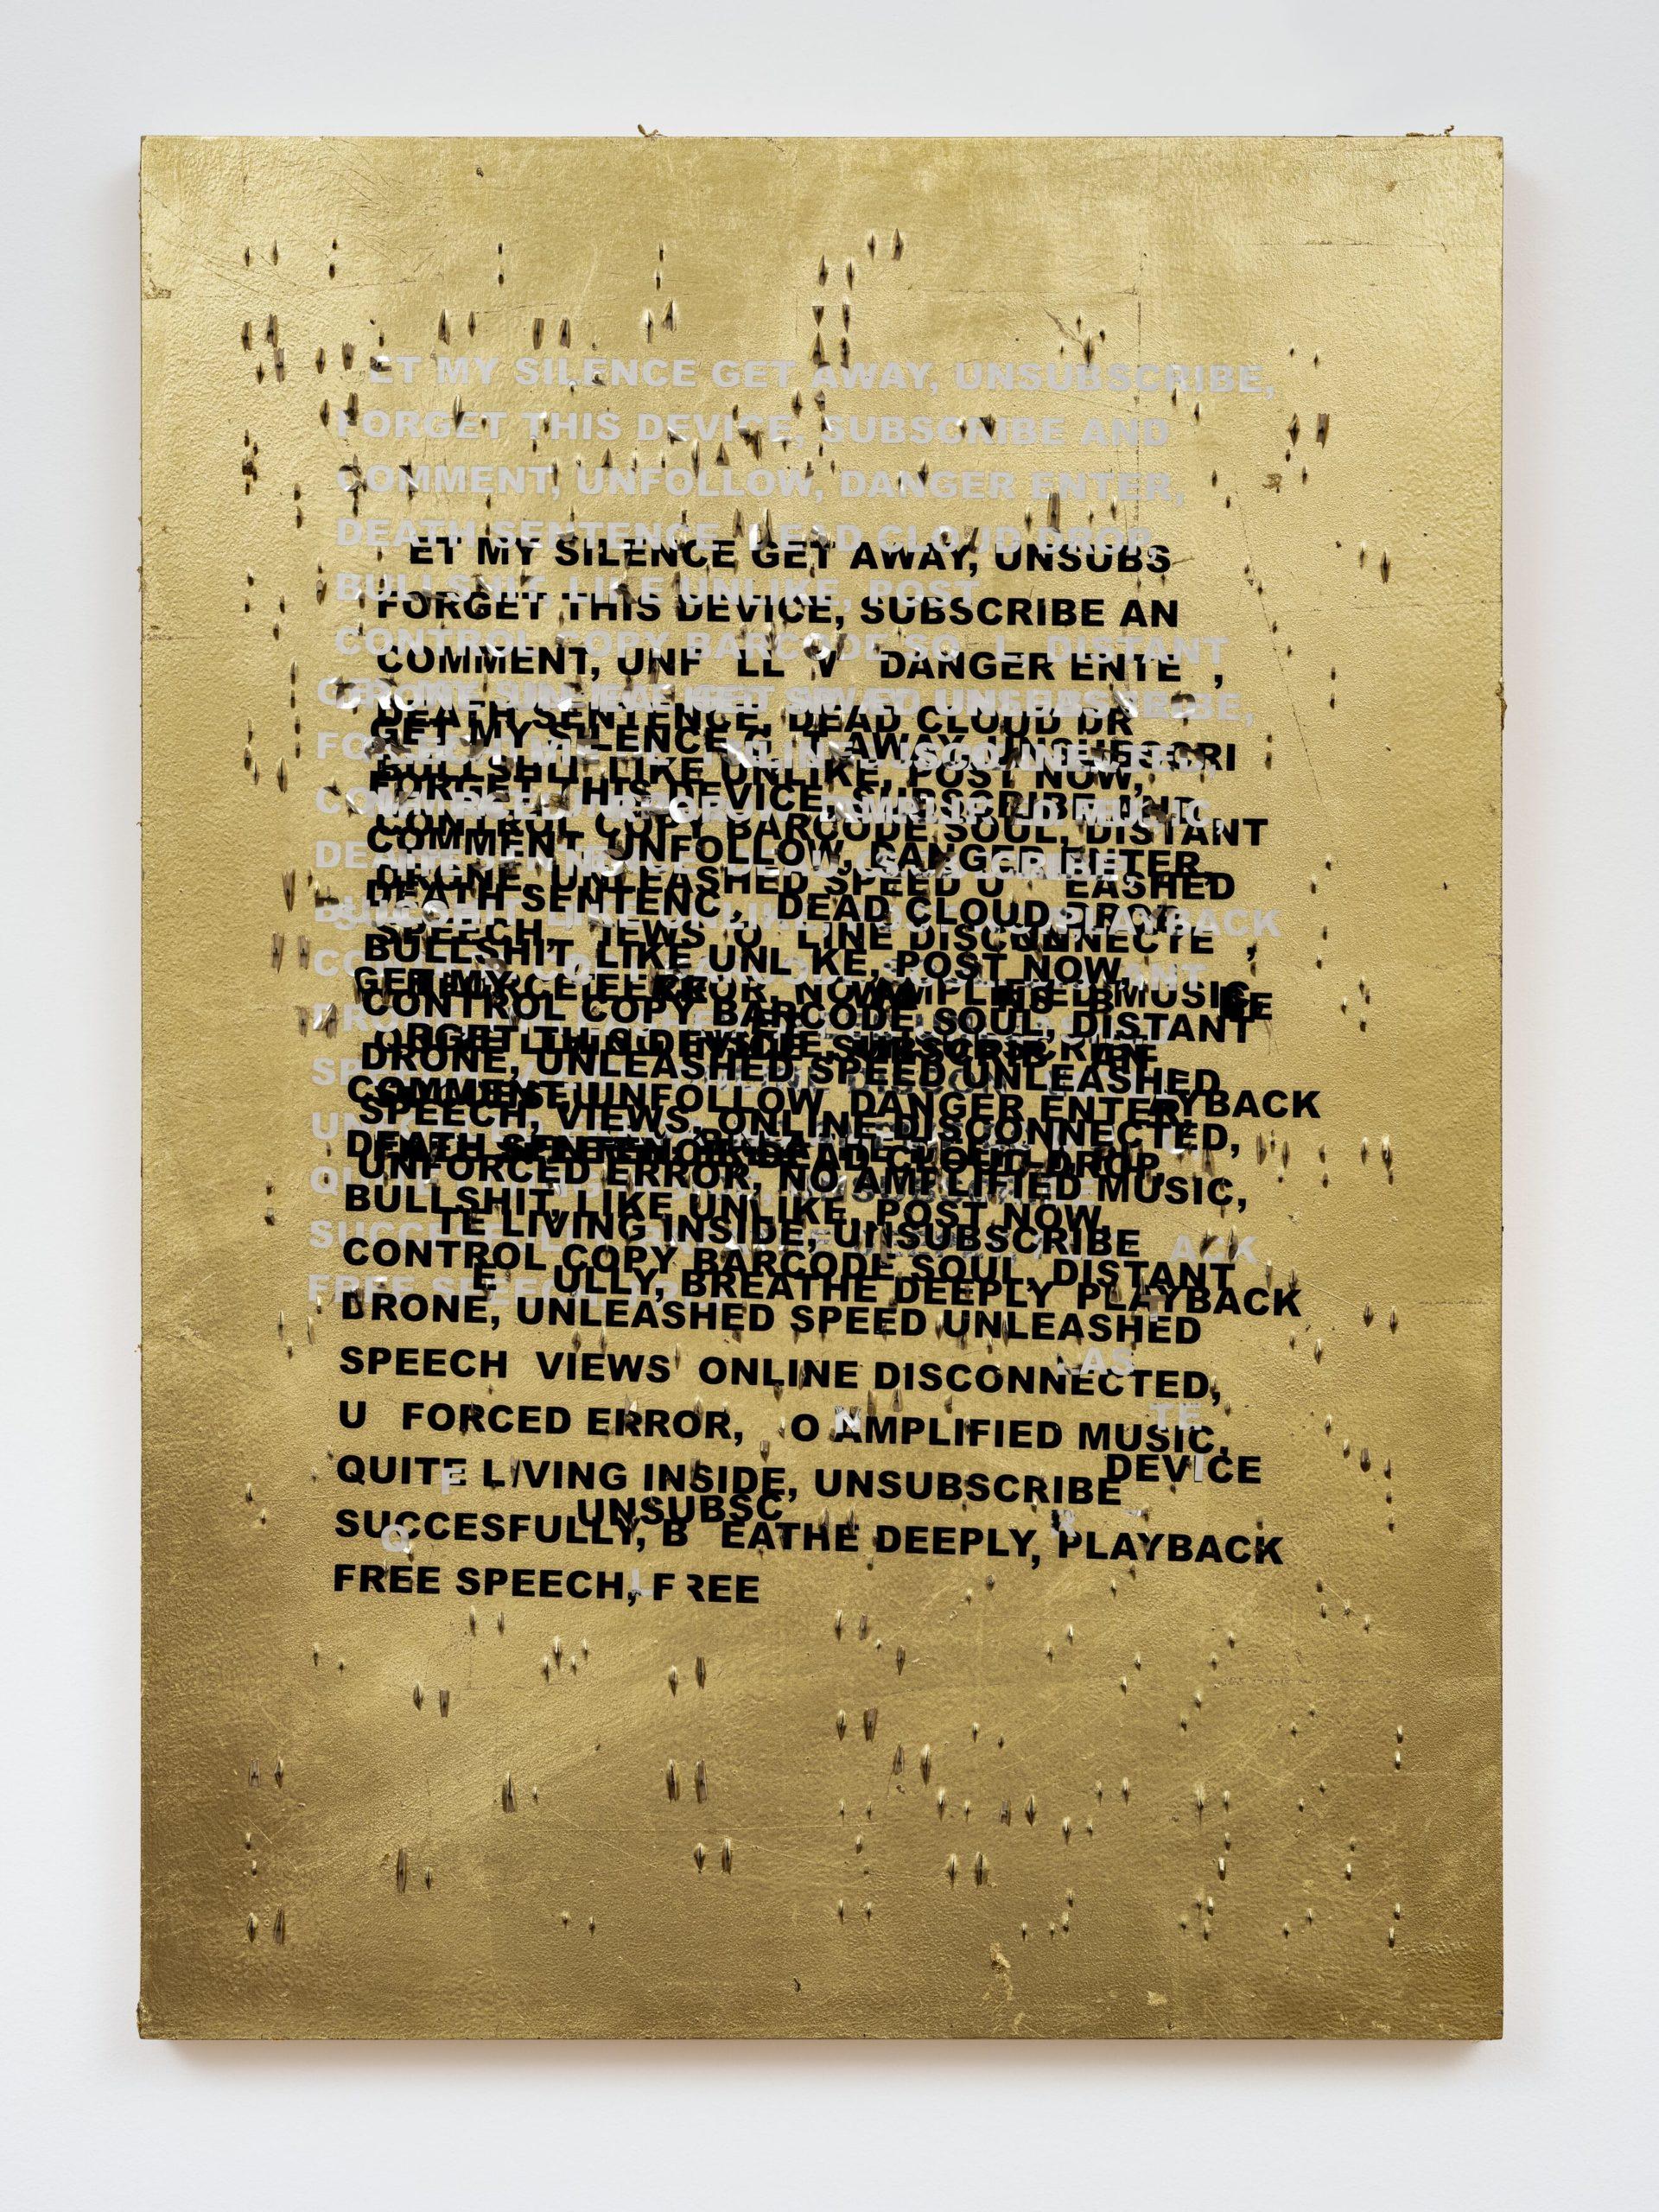 Stefan Brüggemann  SPEED SPEECH (HYPER POEM LOCKDOWN)  2020 Gold leaf, metal staples and vinyl text on wood 70 x 49.7 x 3.5 cm / 27 1/2 x 19 5/8 x 1 3/8 in, © Stefan Brüggemann Courtesy the artist and Hauser & Wirth Photo: Damian Griffiths